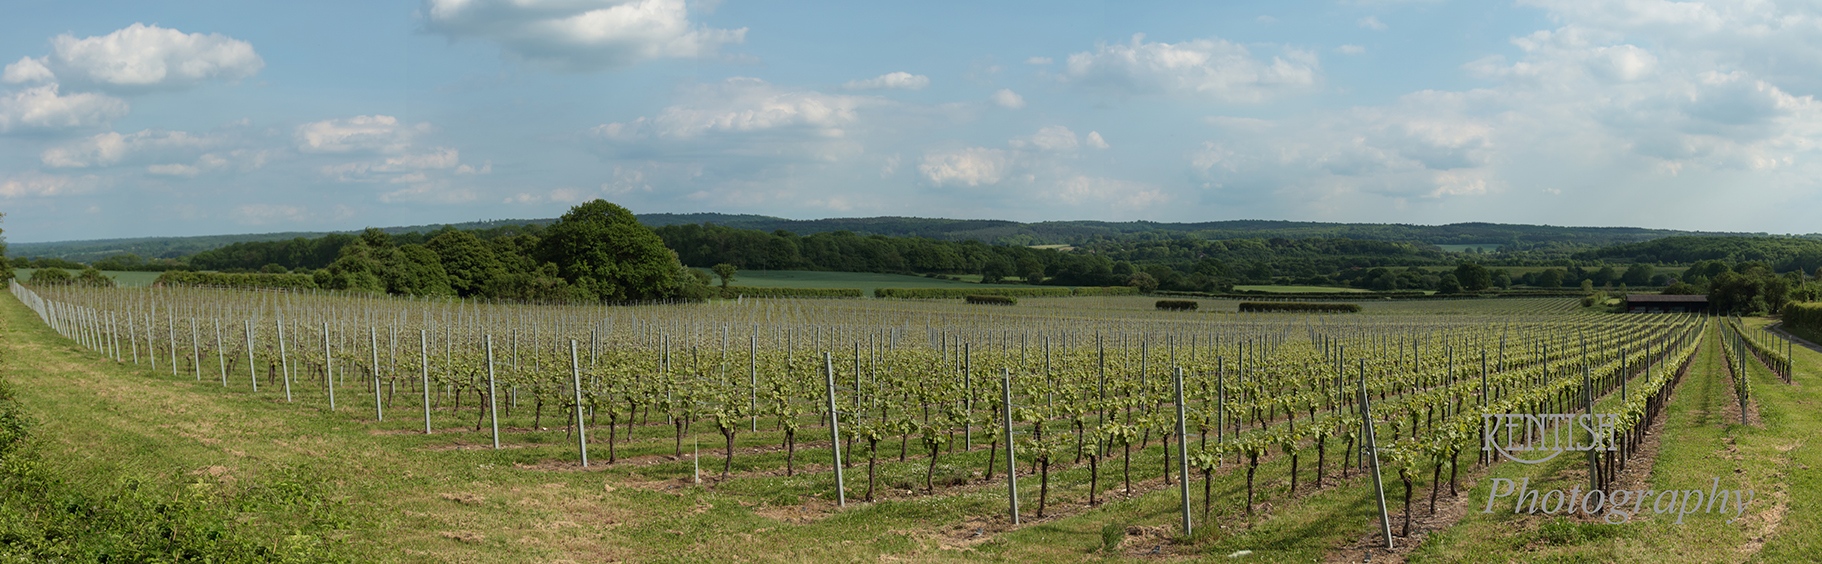 Westerham Vineyard